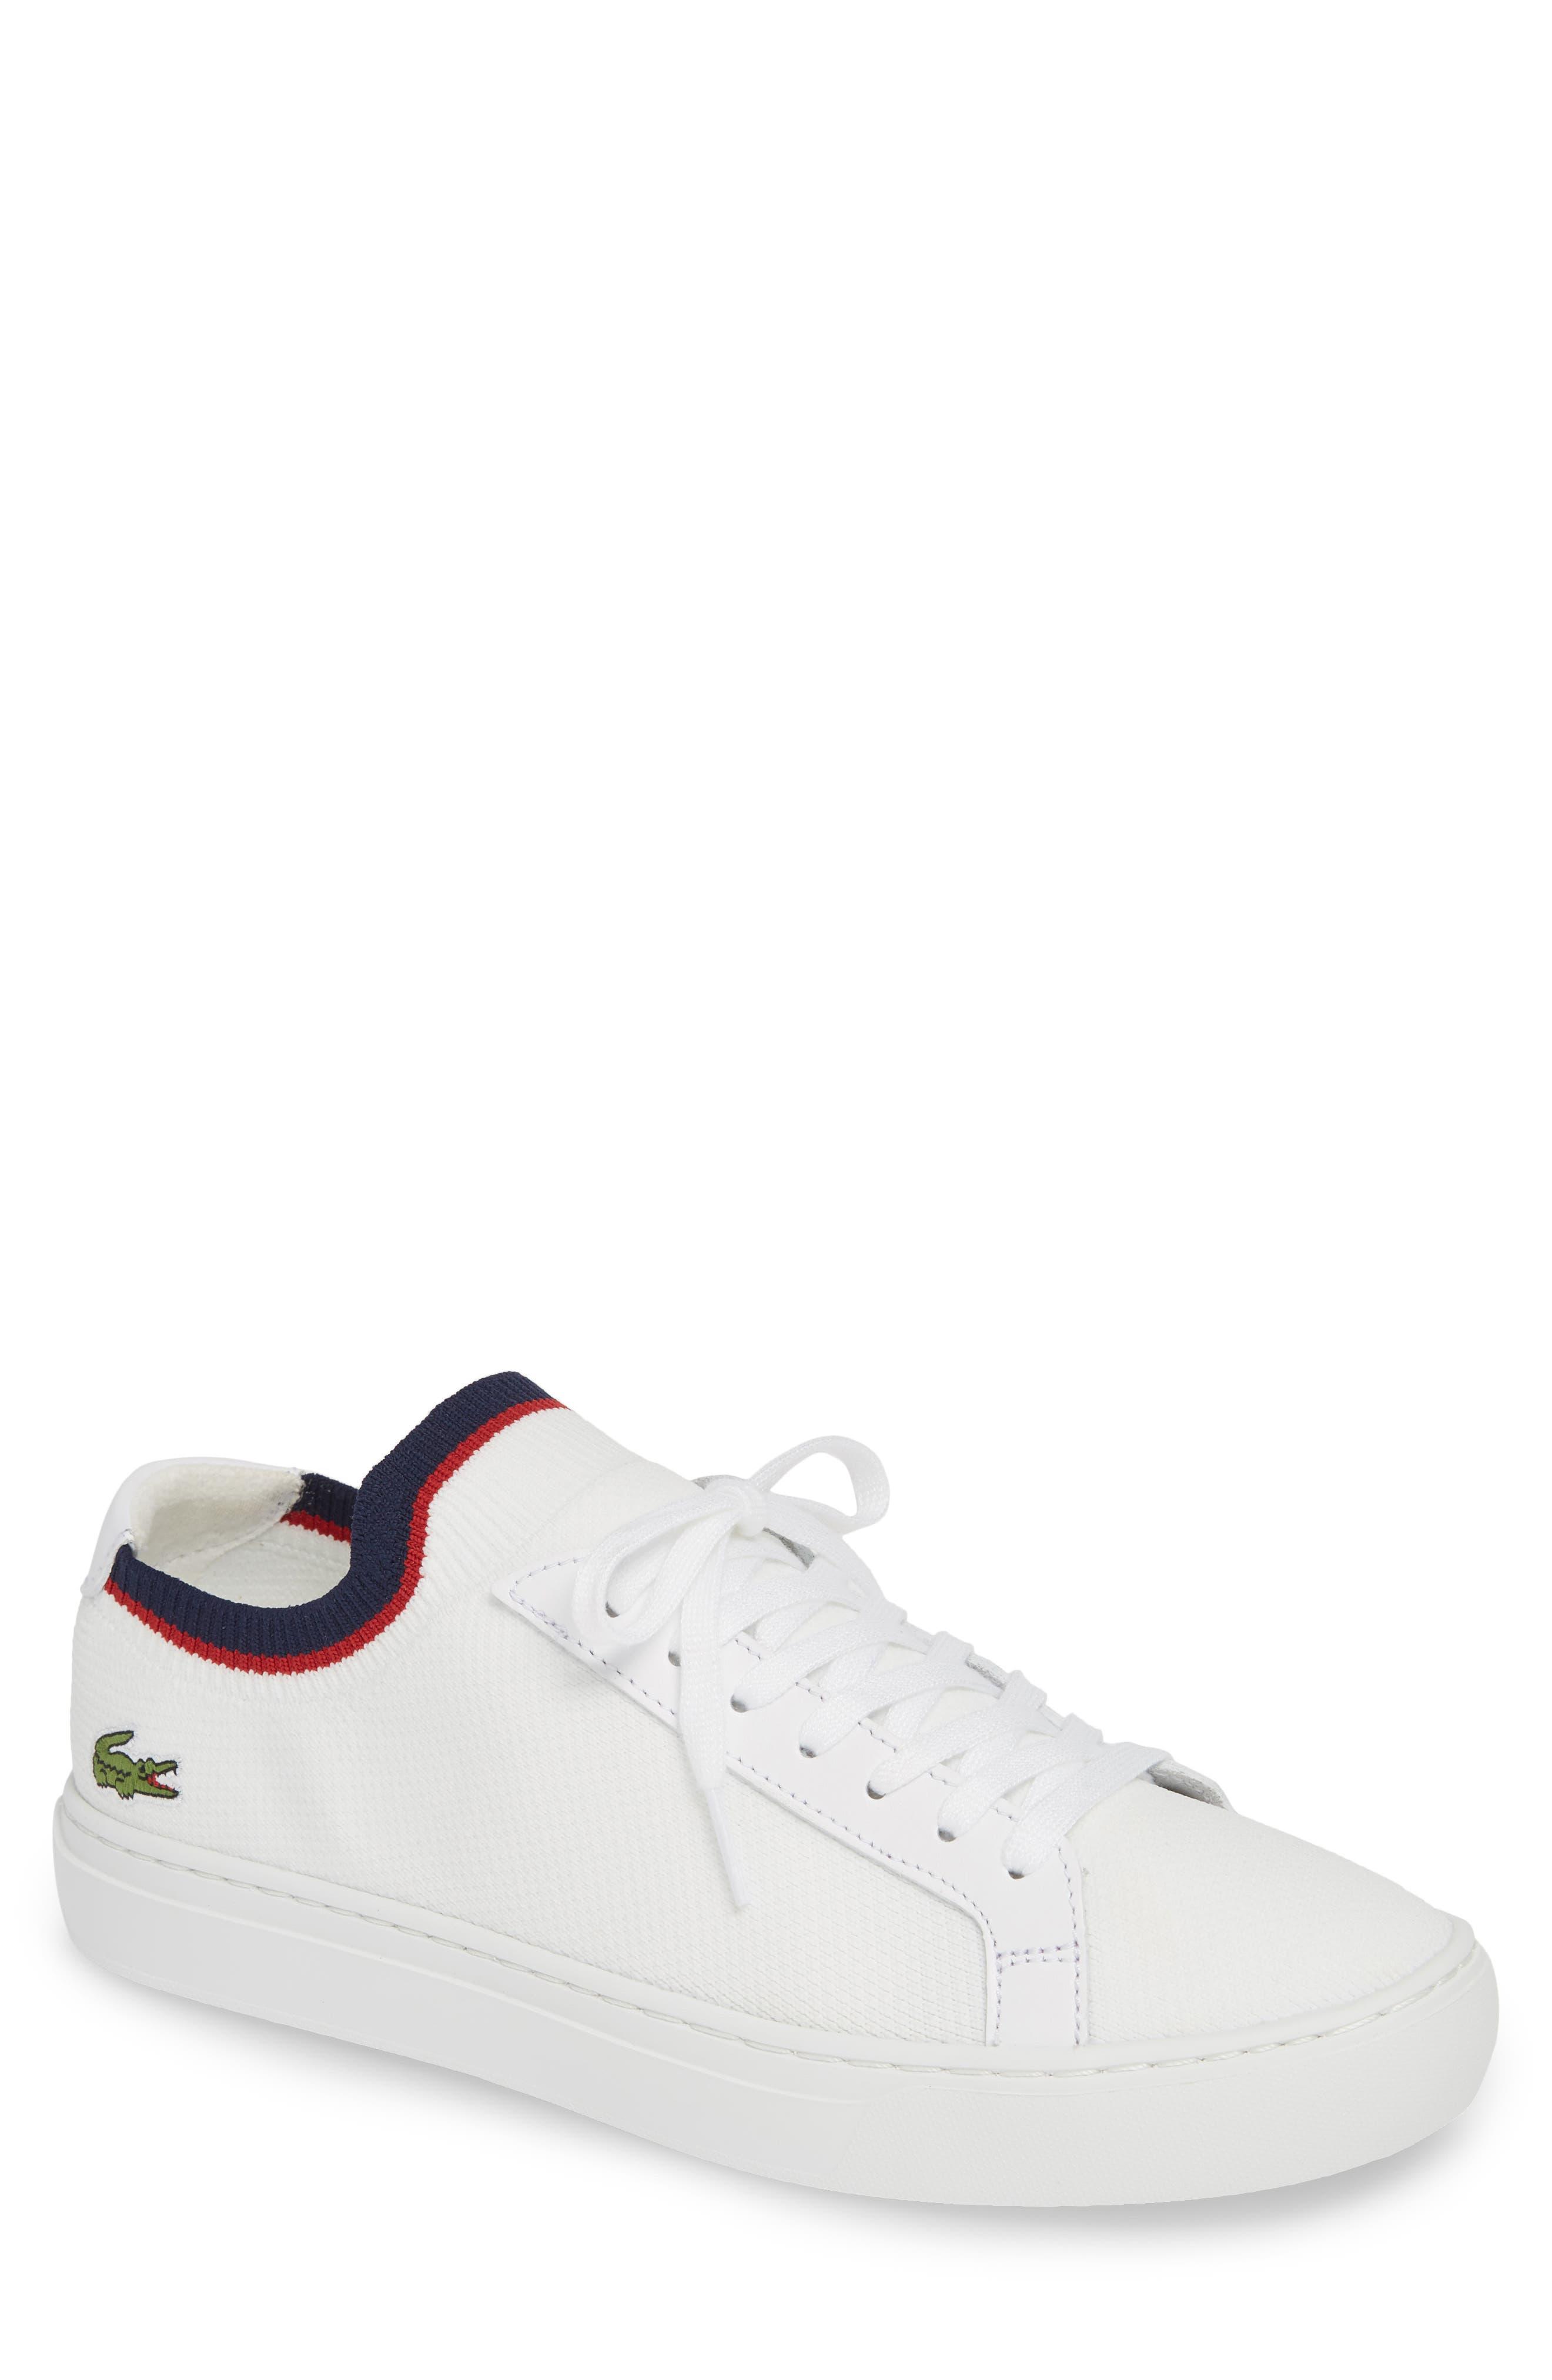 LACOSTE, Piqué Knit Sneaker, Main thumbnail 1, color, WHITE/ NAVY/ RED